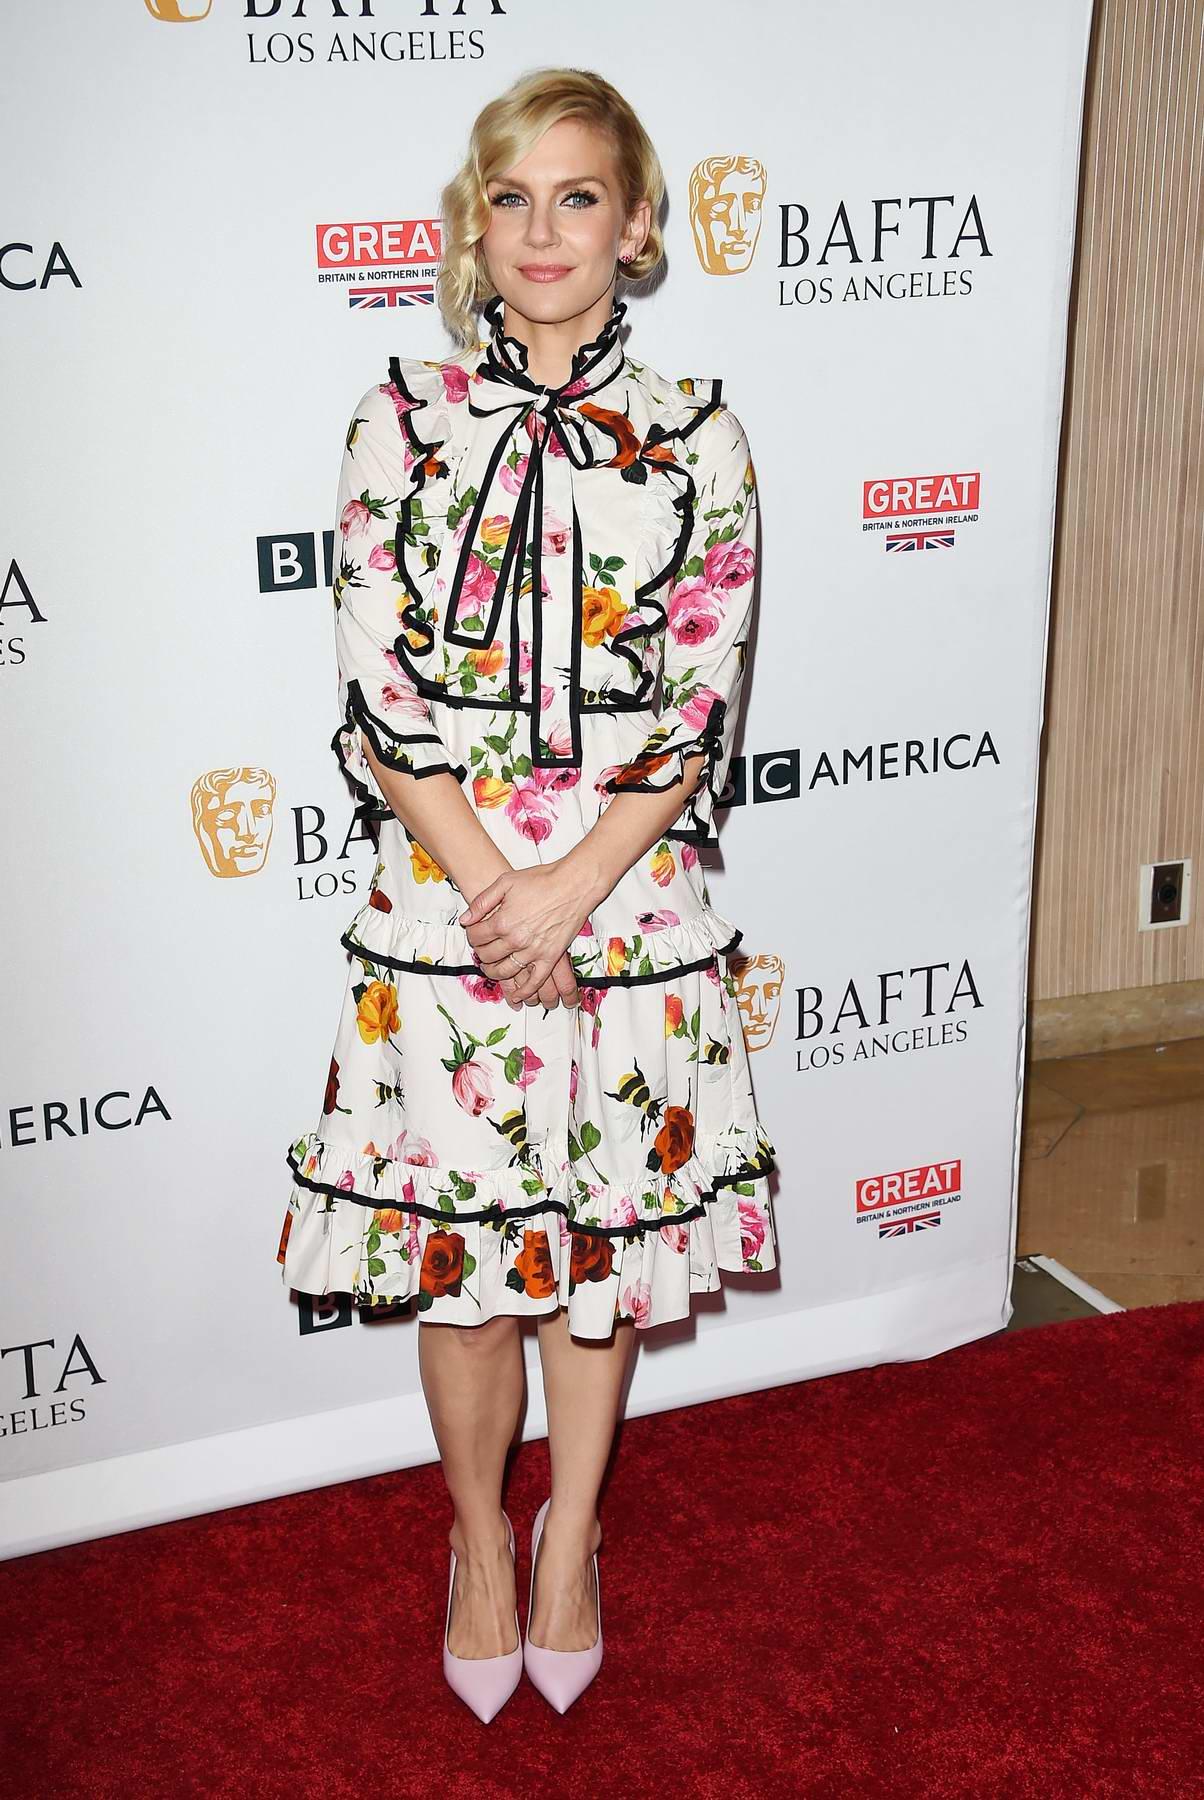 Rhea Seehorn at BBC America BAFTA TV Tea Party in Los Angeles